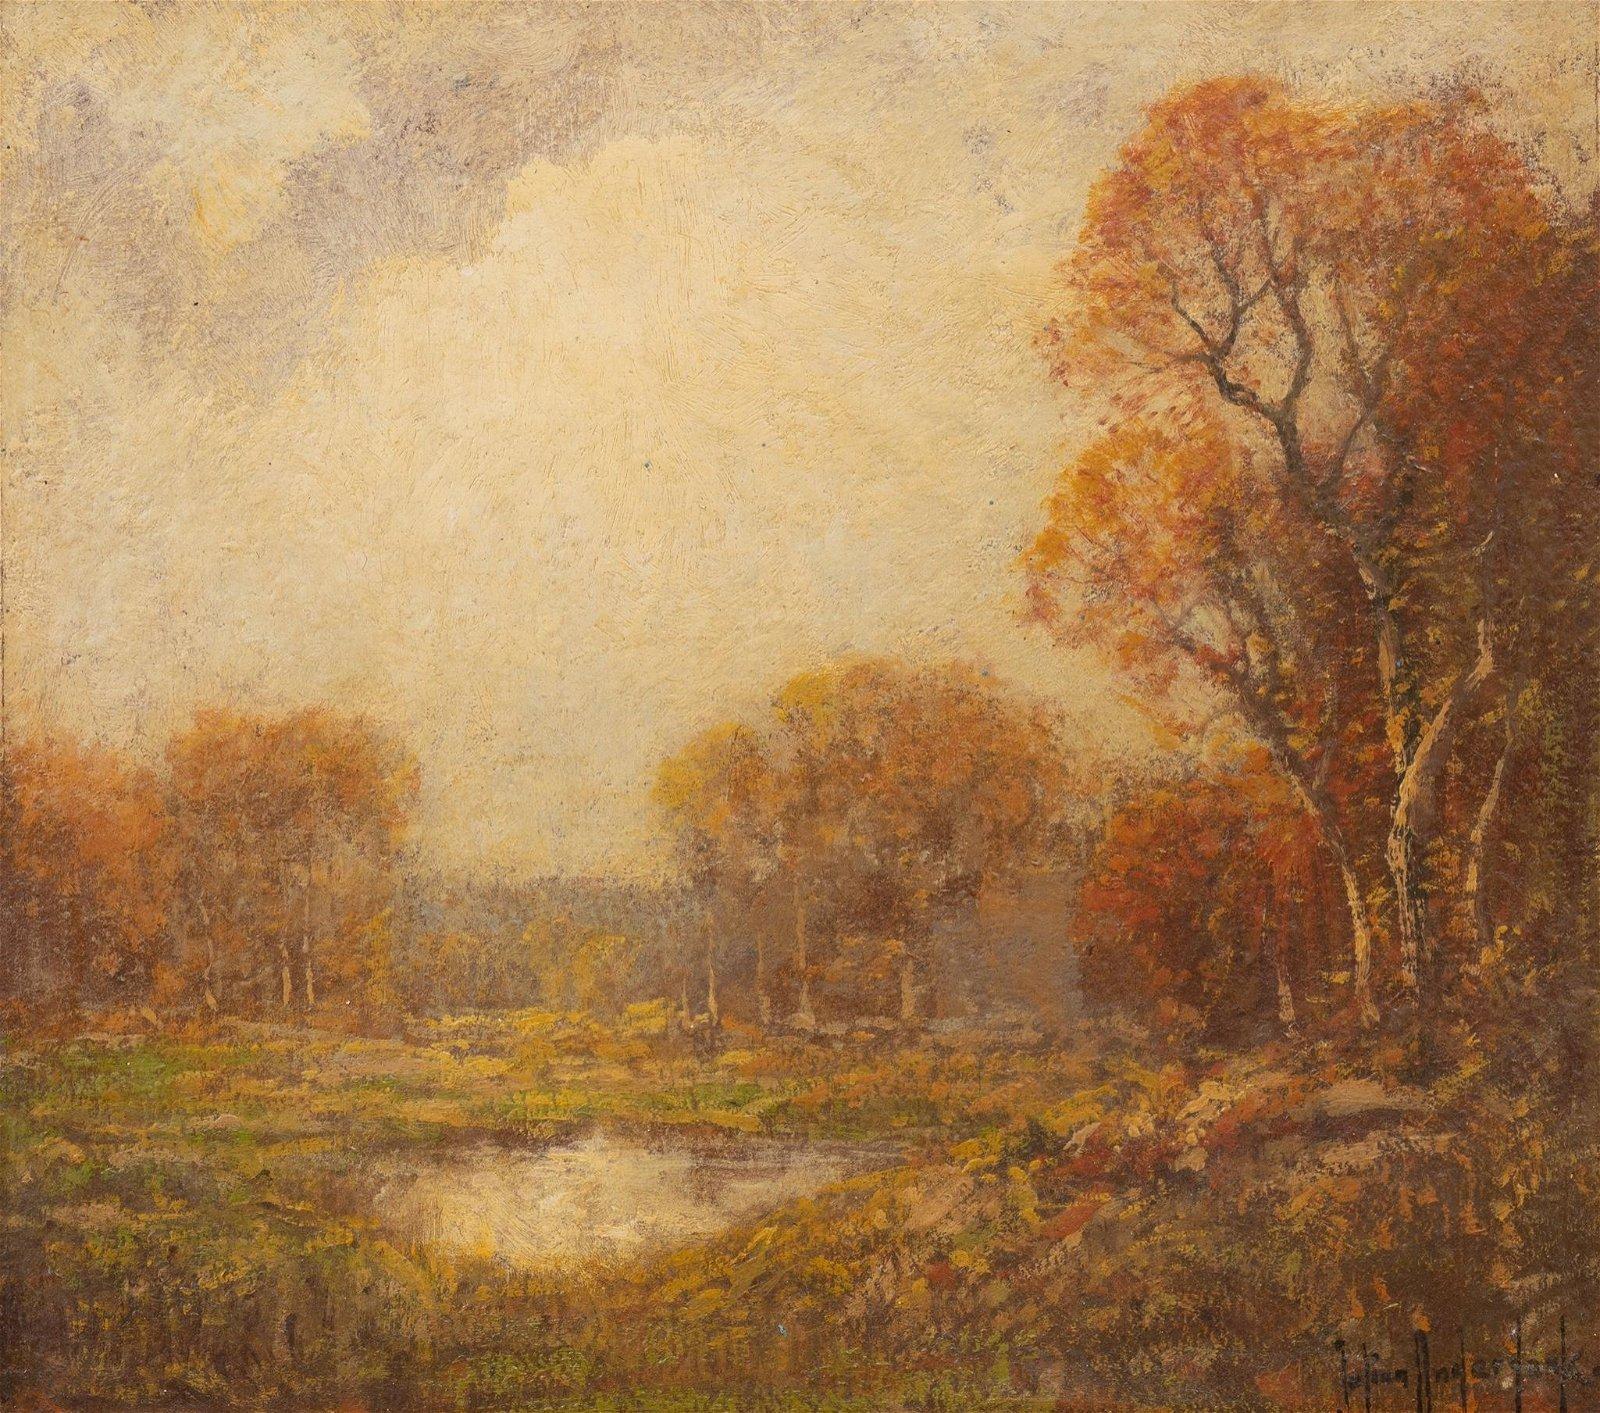 Julian Onderdonk(1882-1922), Autumn Landscape, oil